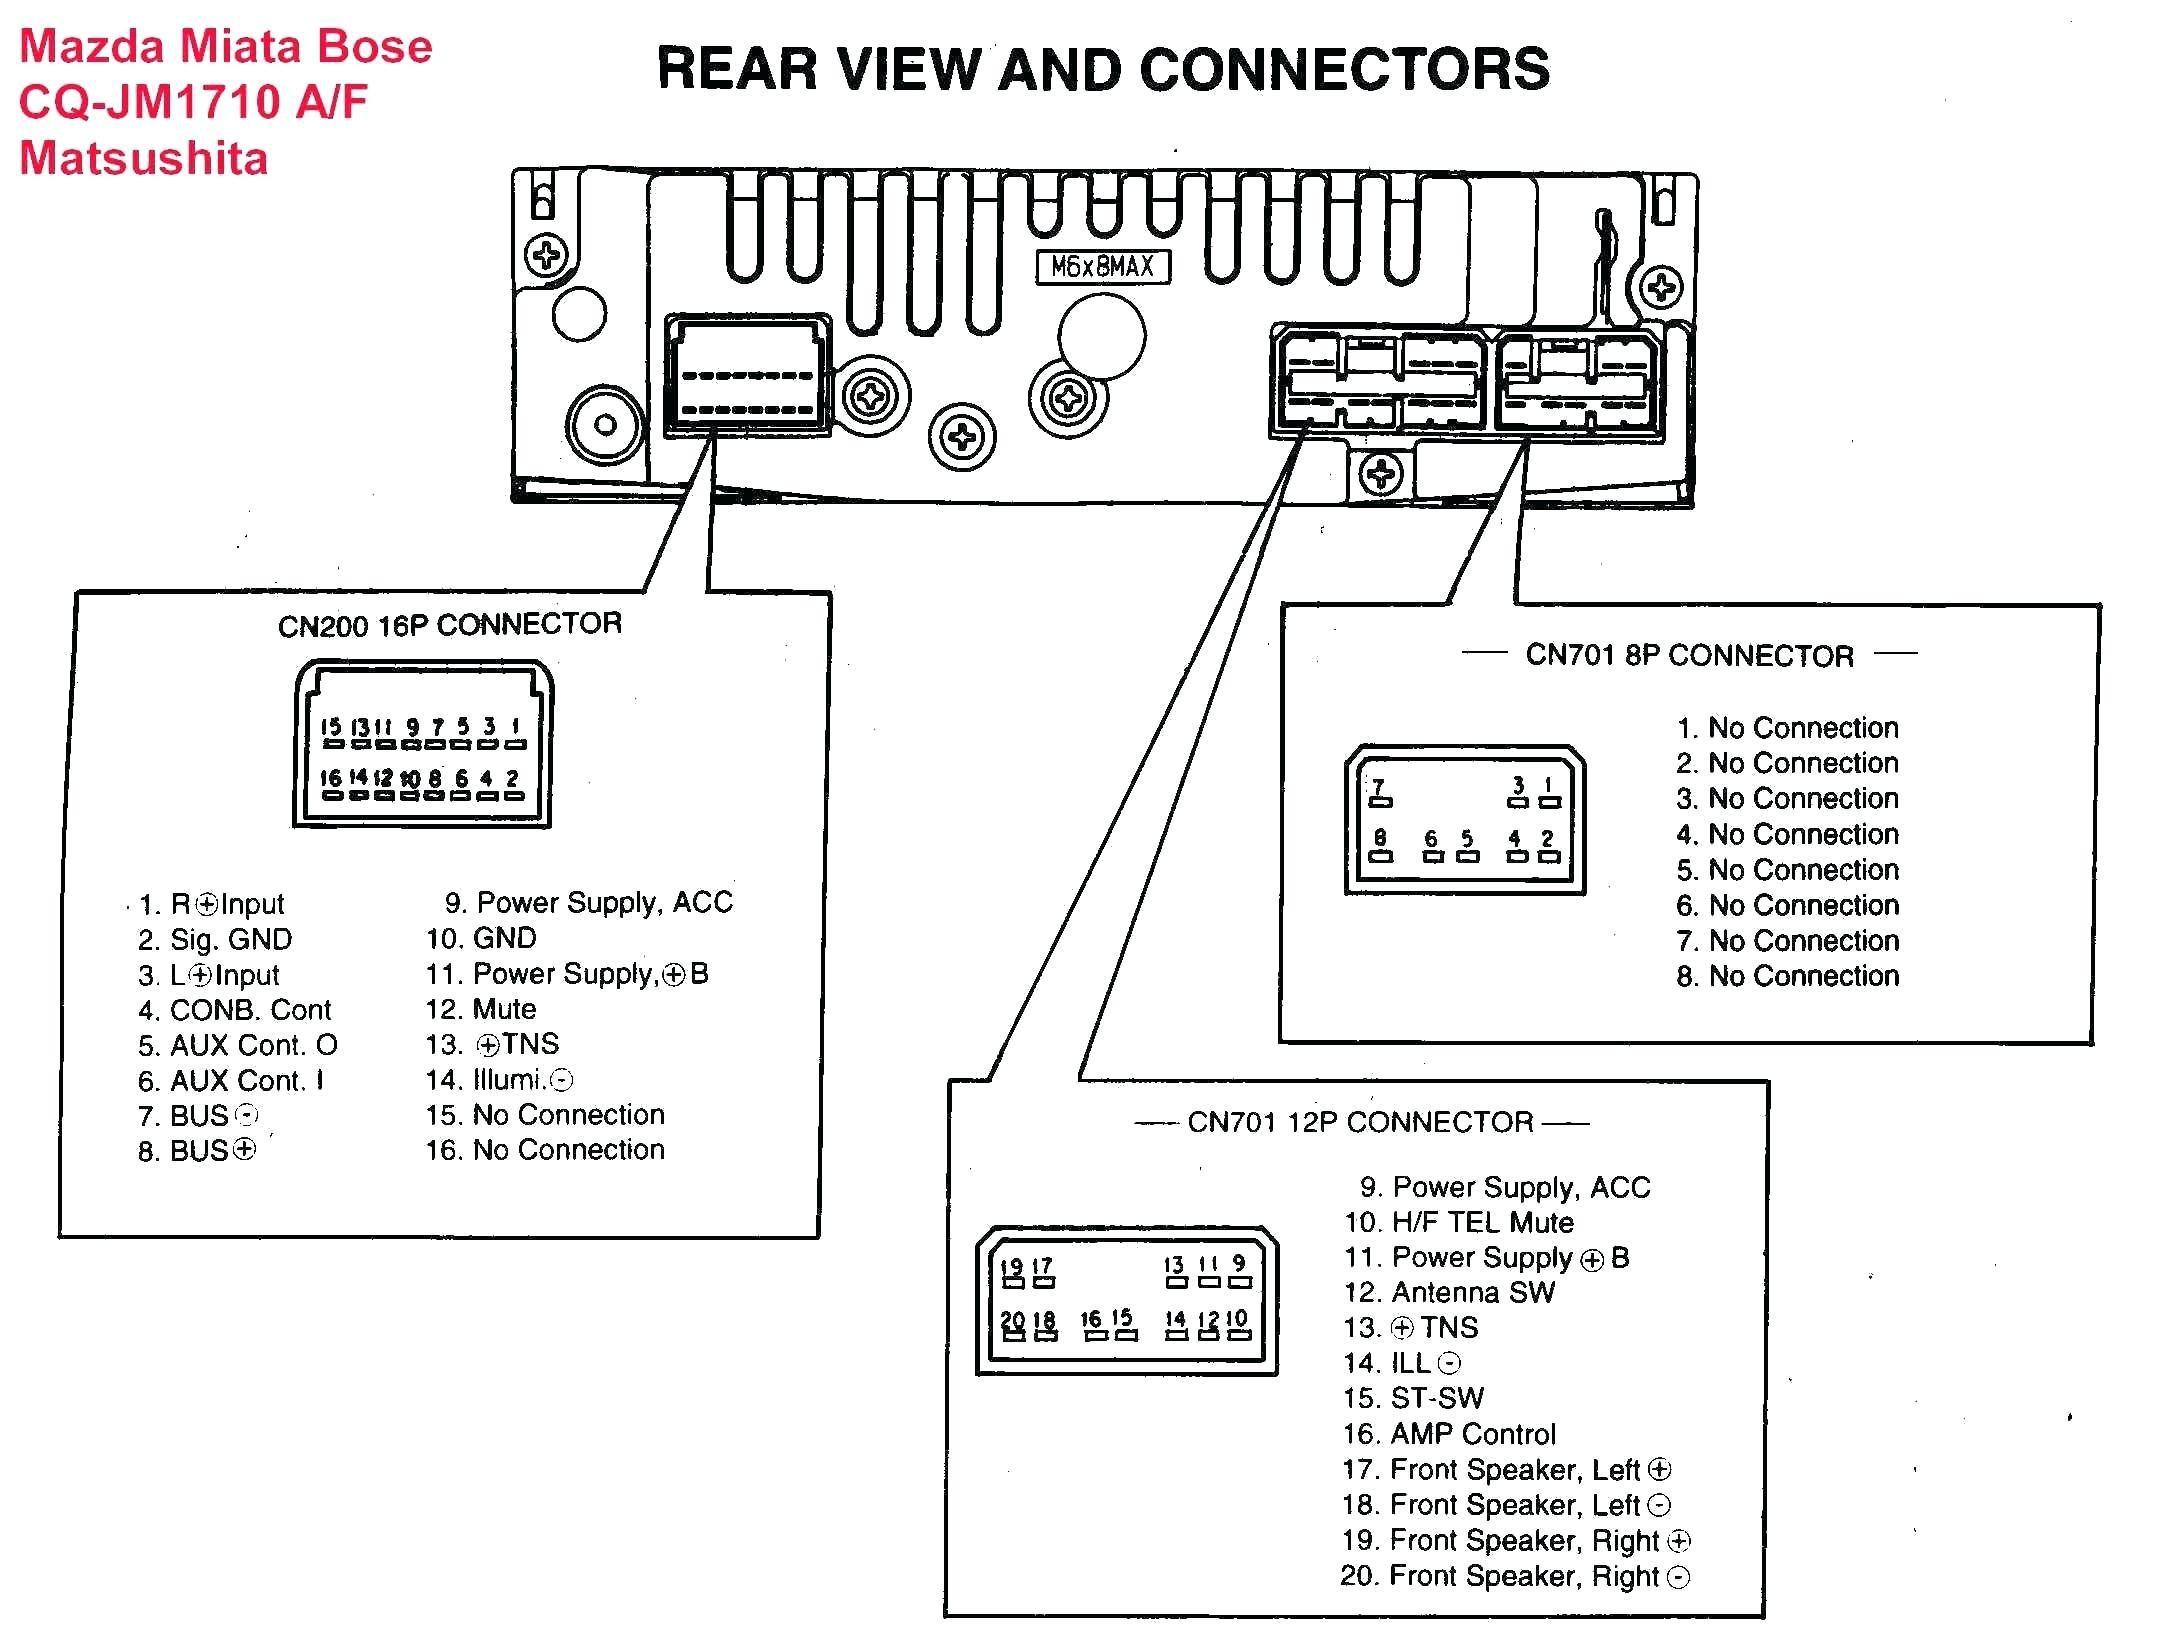 Chevy Cavalier Alarm Wiring Diagram Wiring Diagram Brown Support A Brown Support A Zaafran It